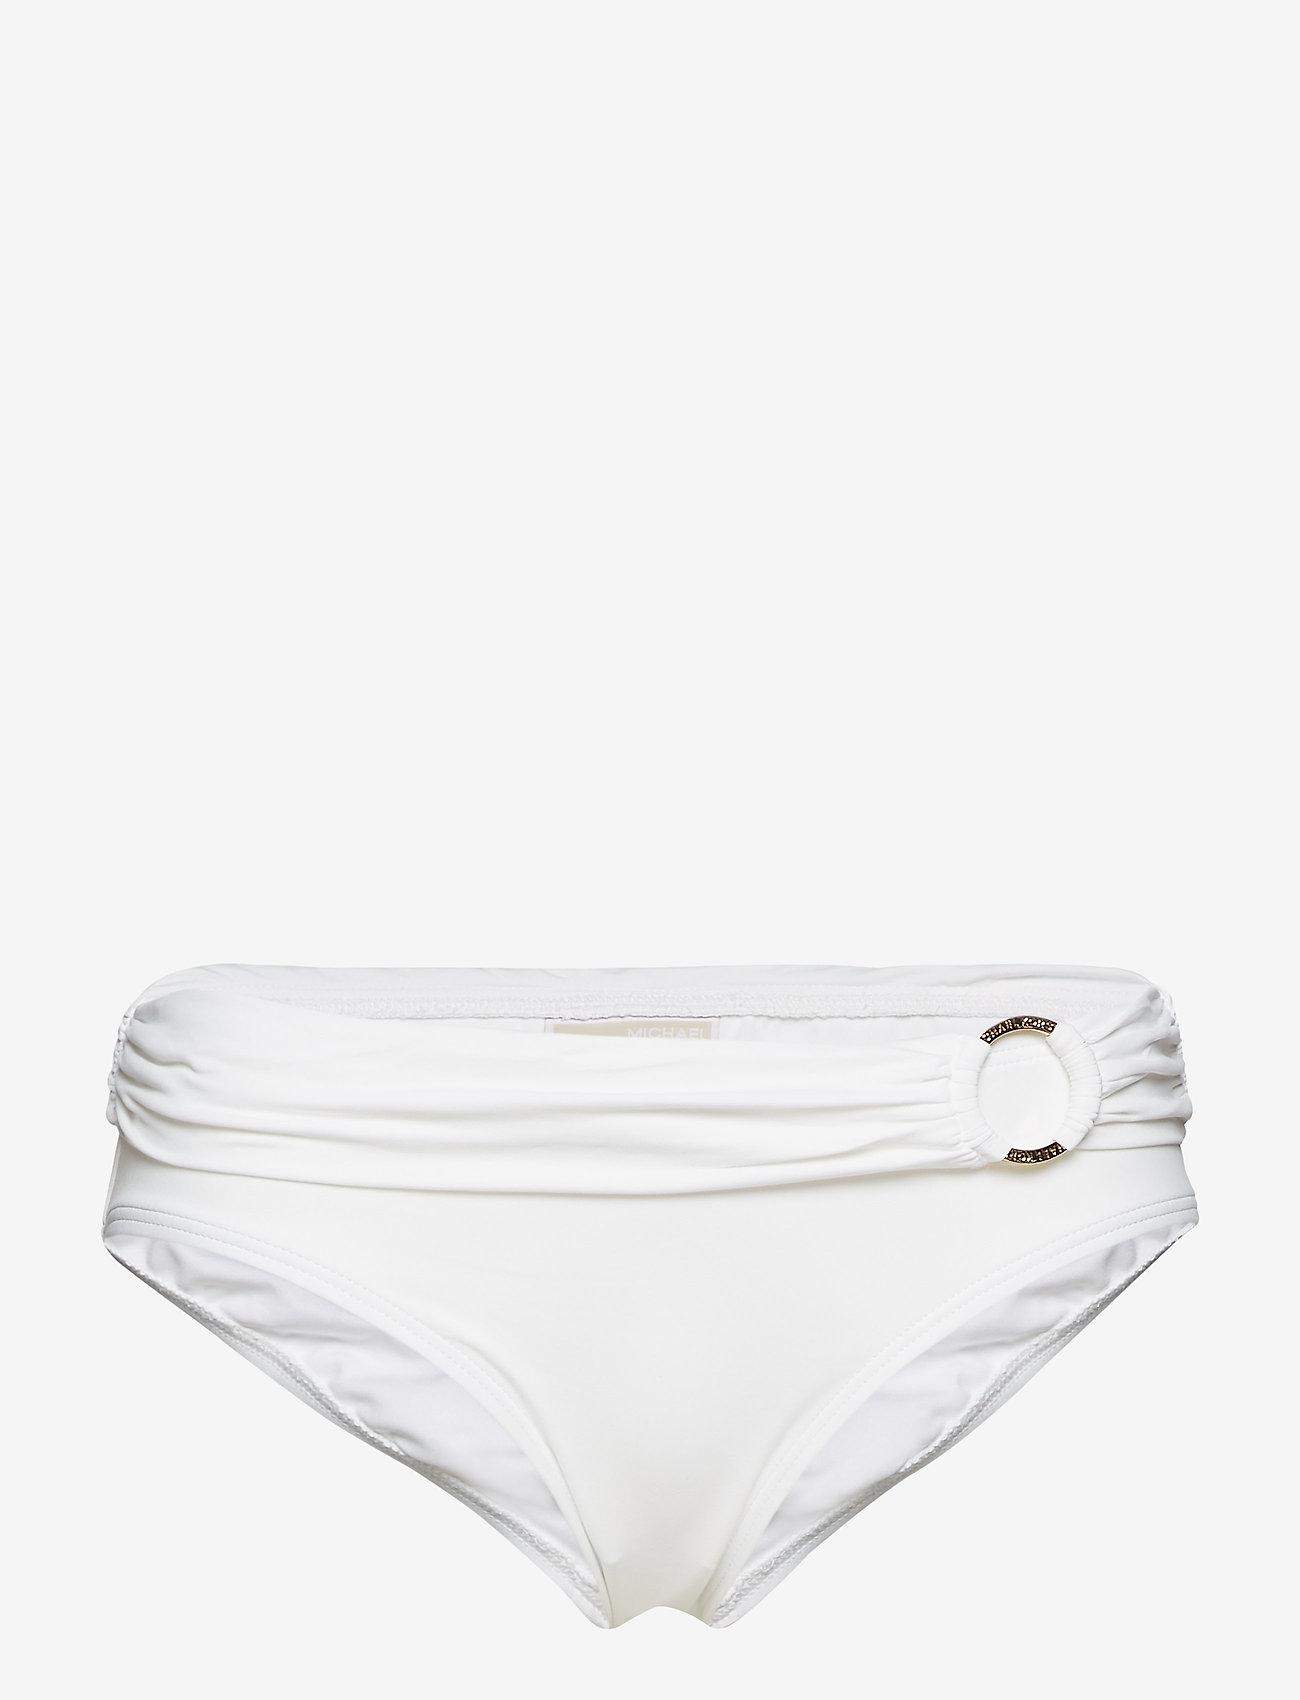 Michael Kors Swimwear - BIKINI BTM - bikinibroekjes - white - 1